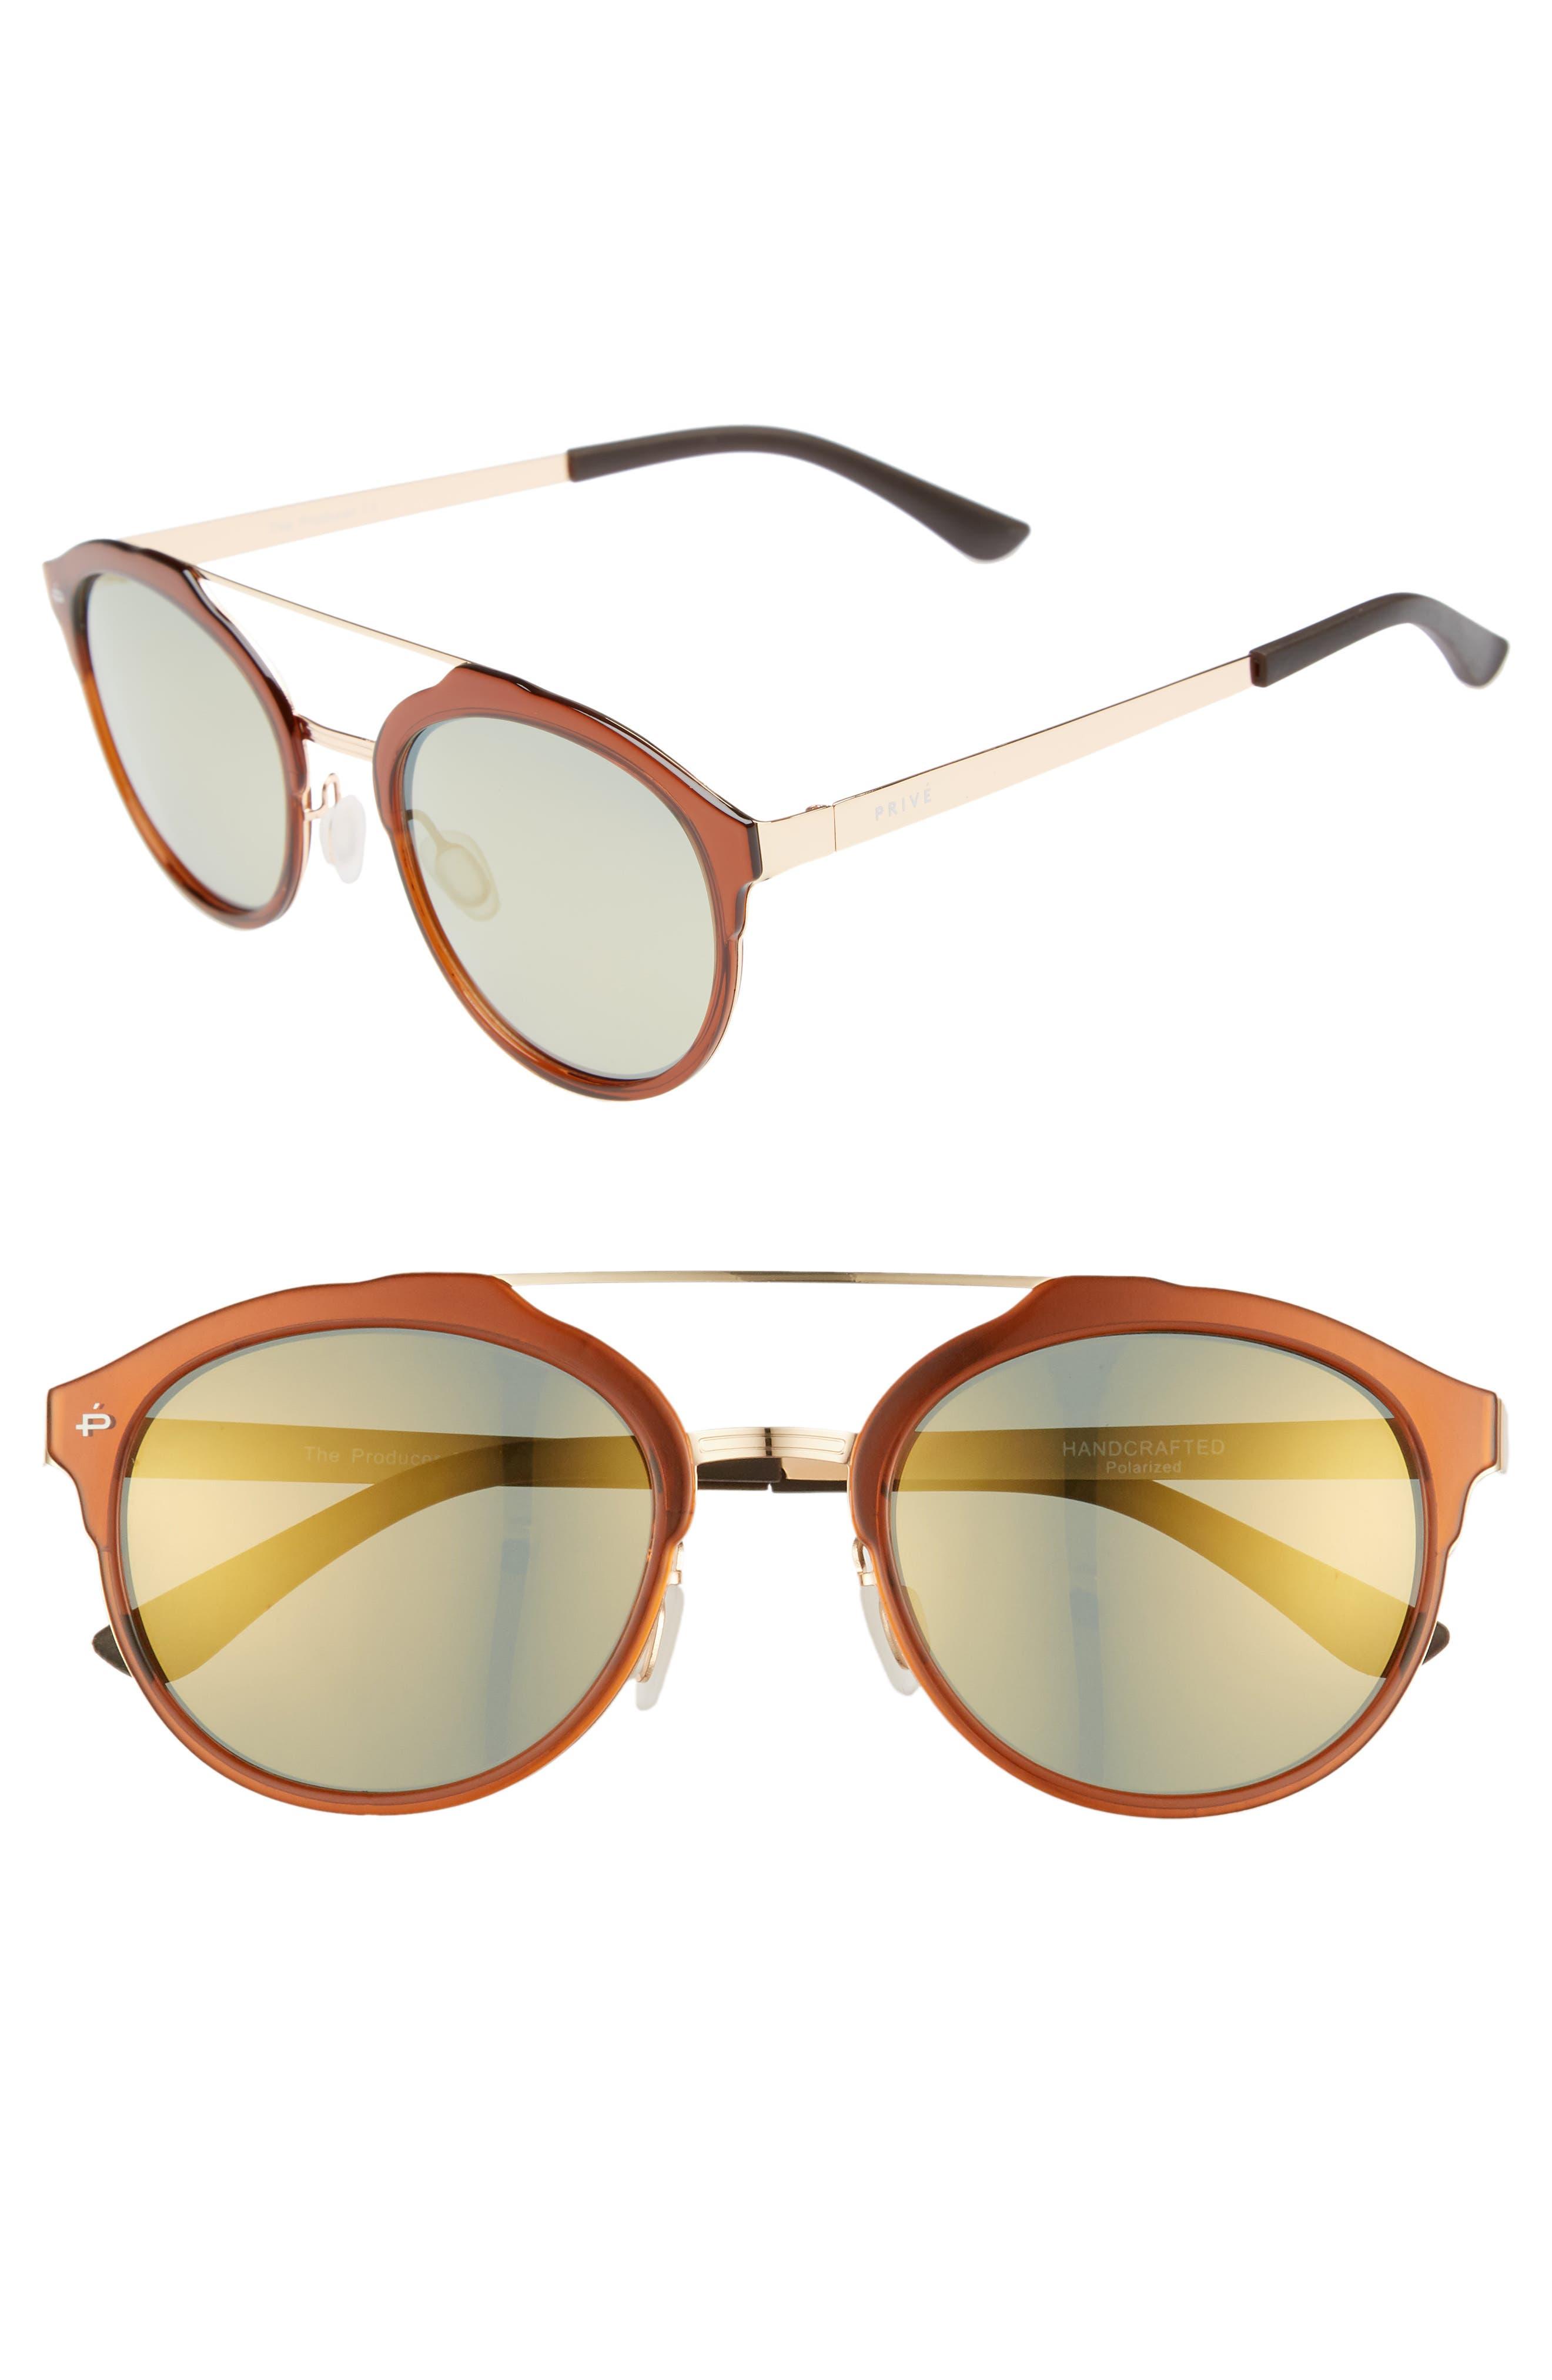 Privé Revaux The Producer 50mm Polarized Sunglasses,                         Main,                         color, Brown